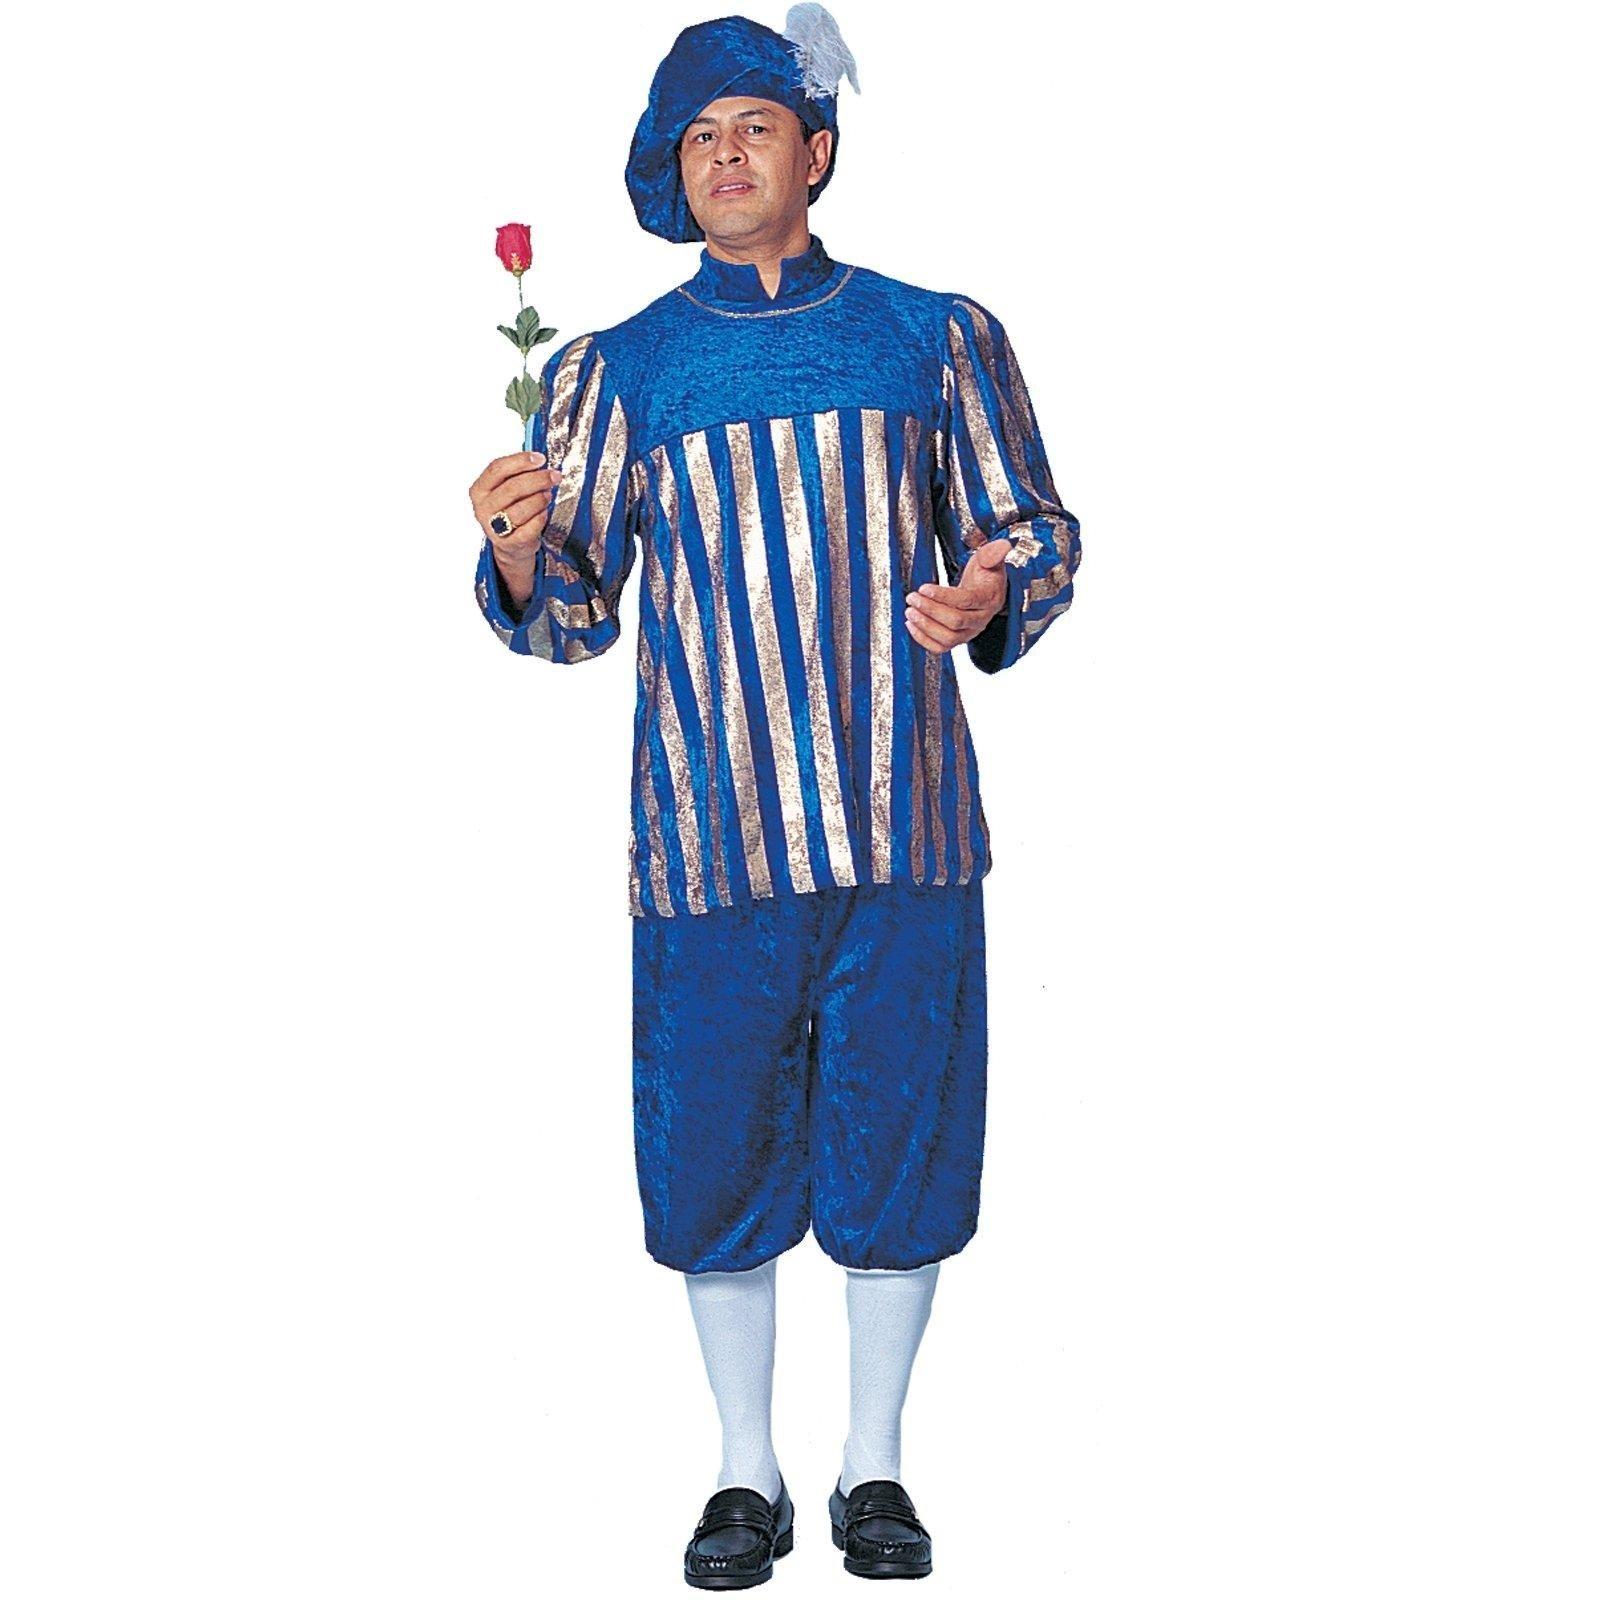 10 Fabulous Romeo And Juliet Costume Ideas romeo and juliet costumes drawing google search romeo and juliet 2020